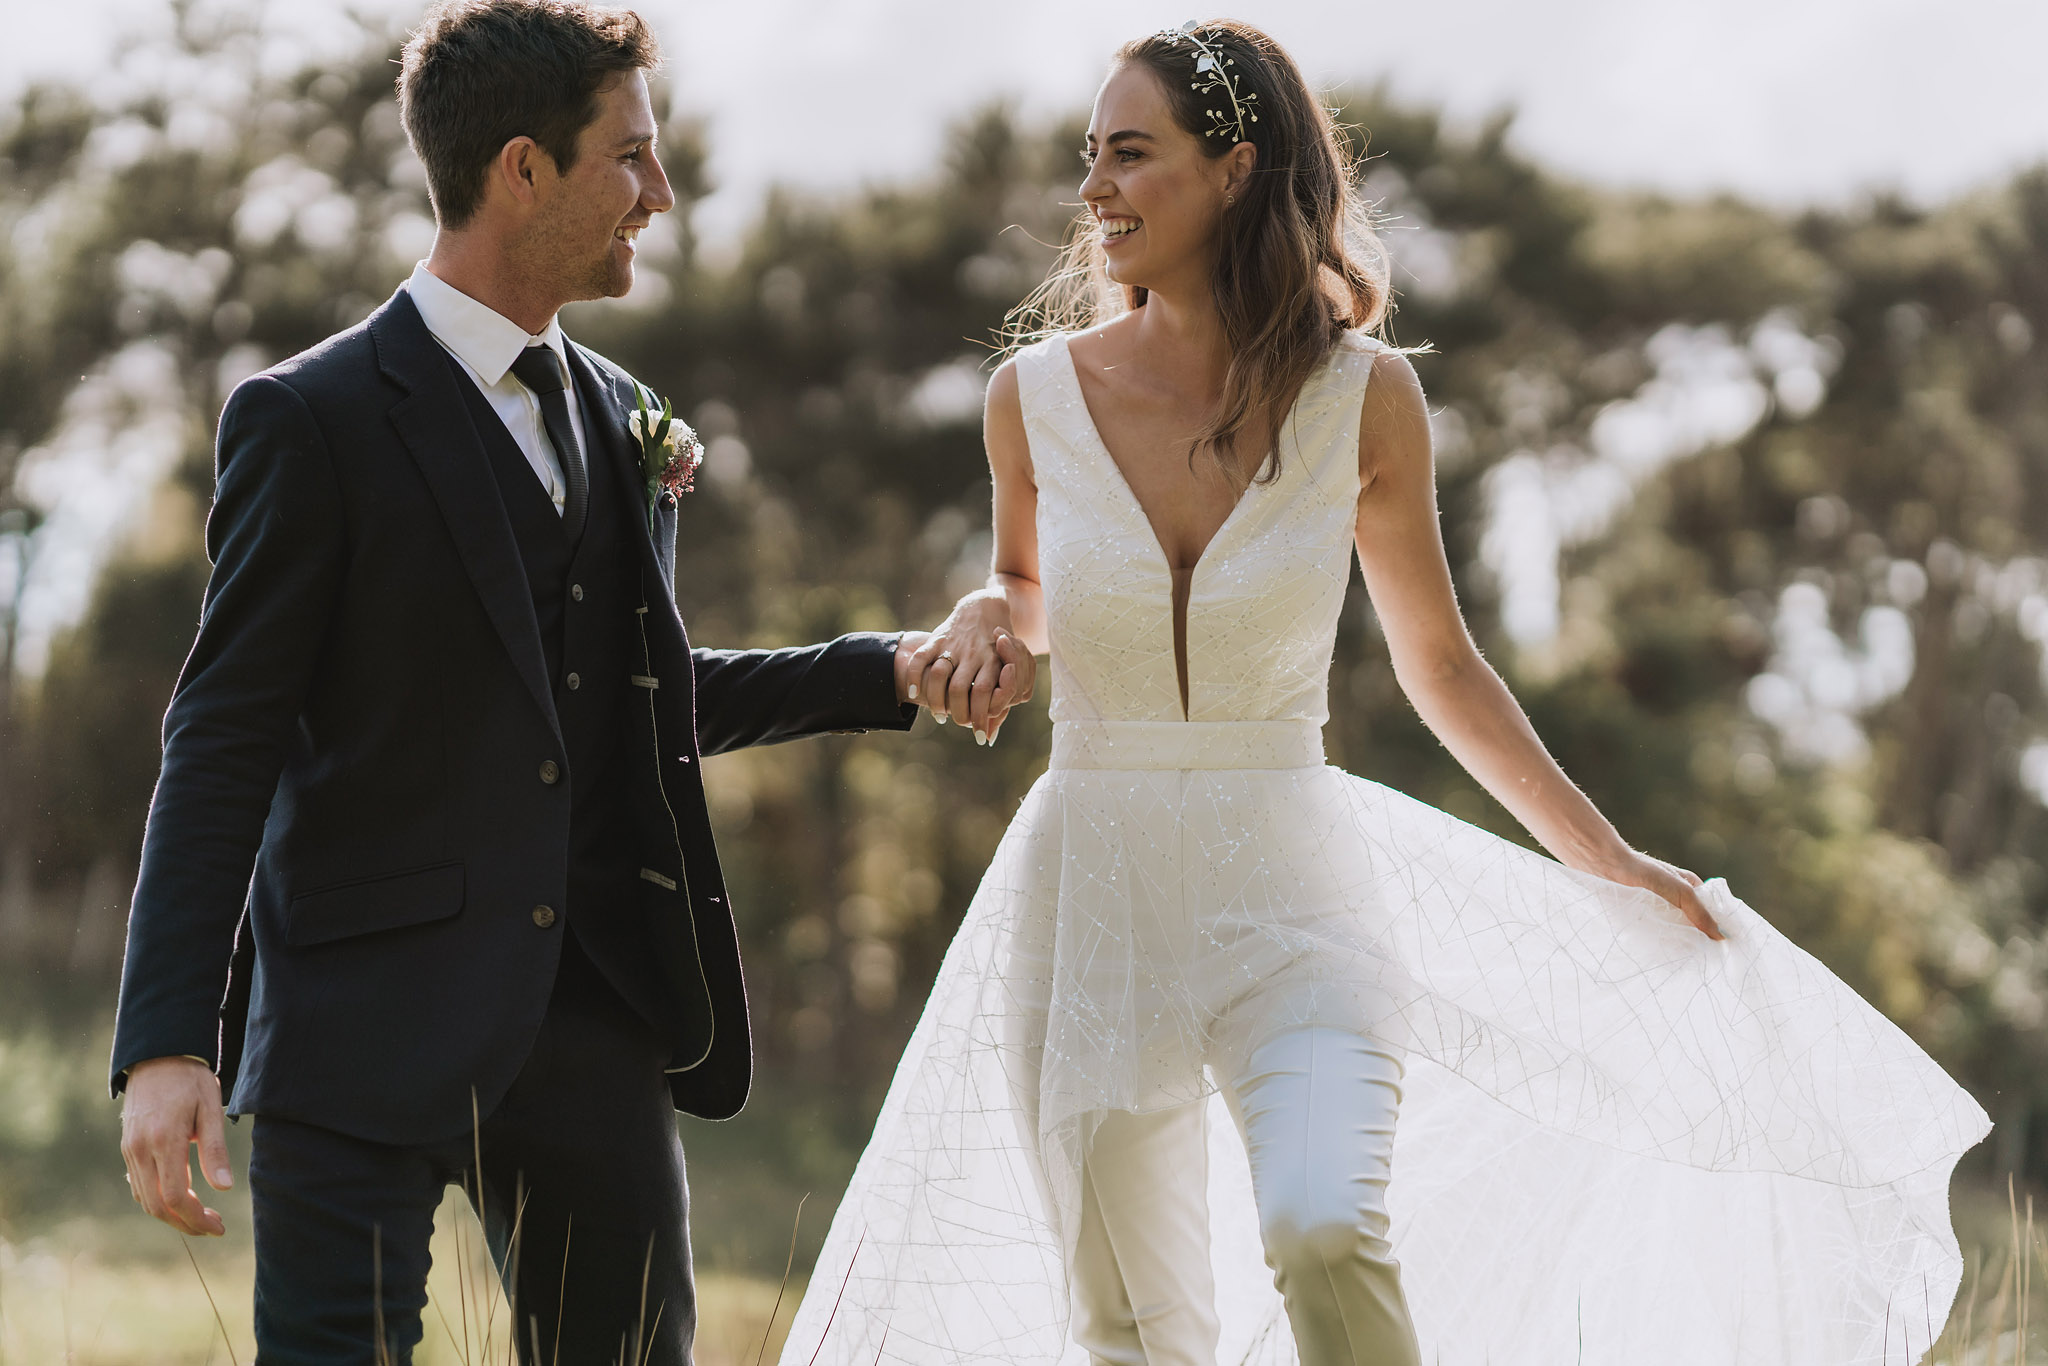 rambo-estrada-rubymatt-kauri-bay-boomrock-auckland-wedding-photographers-0329-c copy.jpg